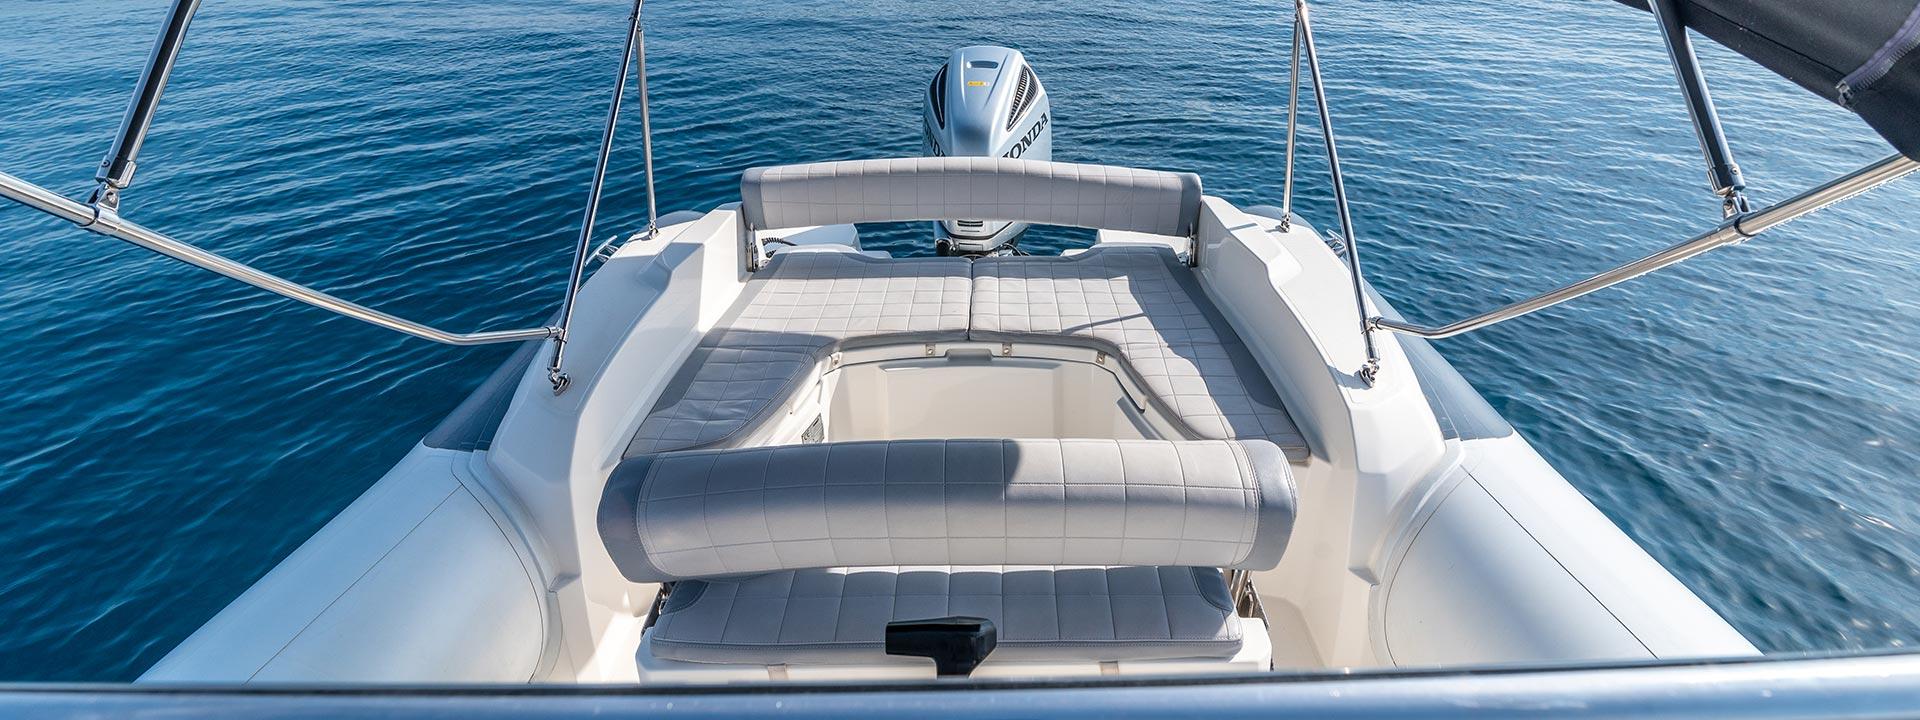 mayer-charter-boat-header-jeanneau-marlin-790-04